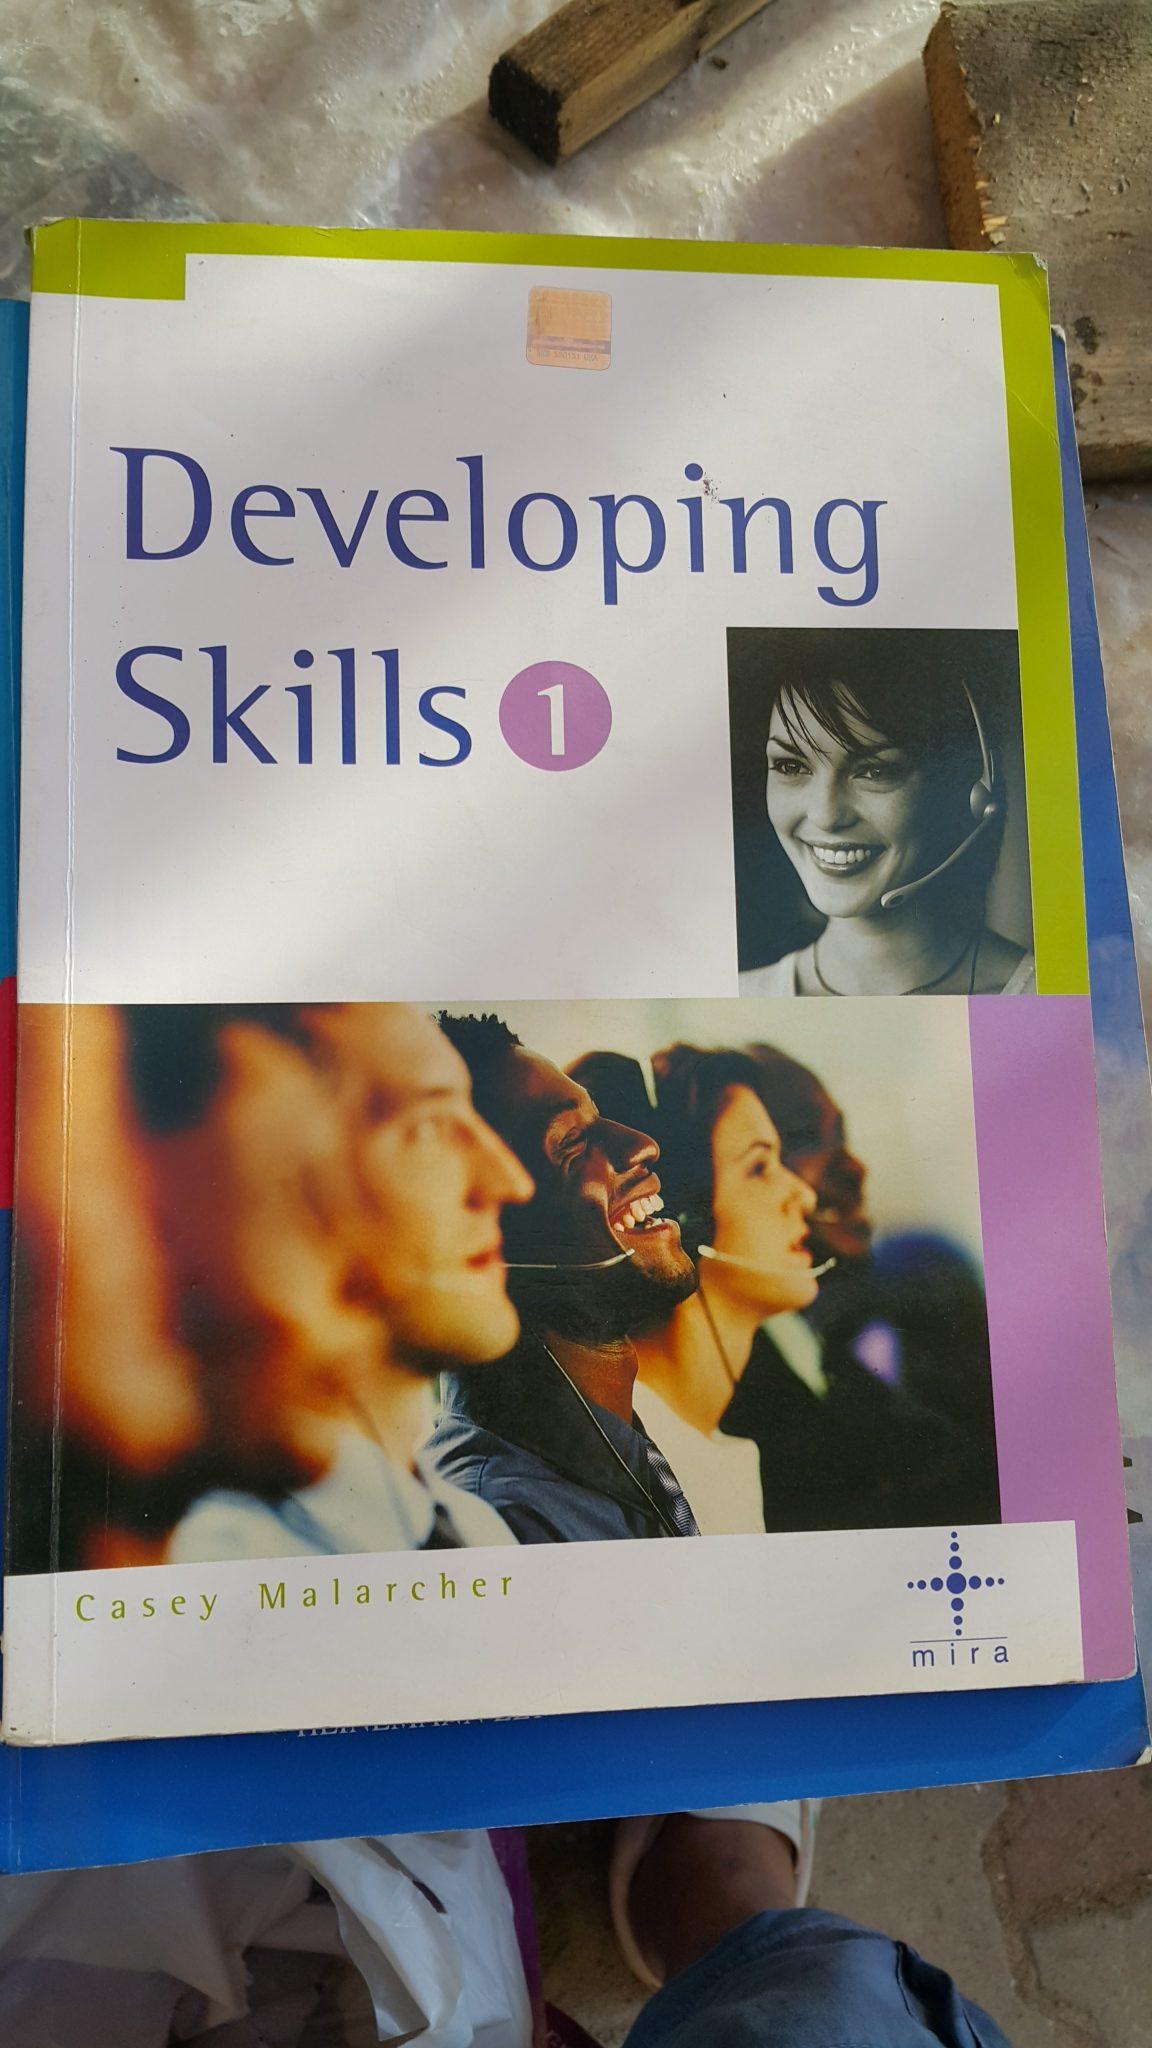 Developing Skills 1. Casey Malarcher